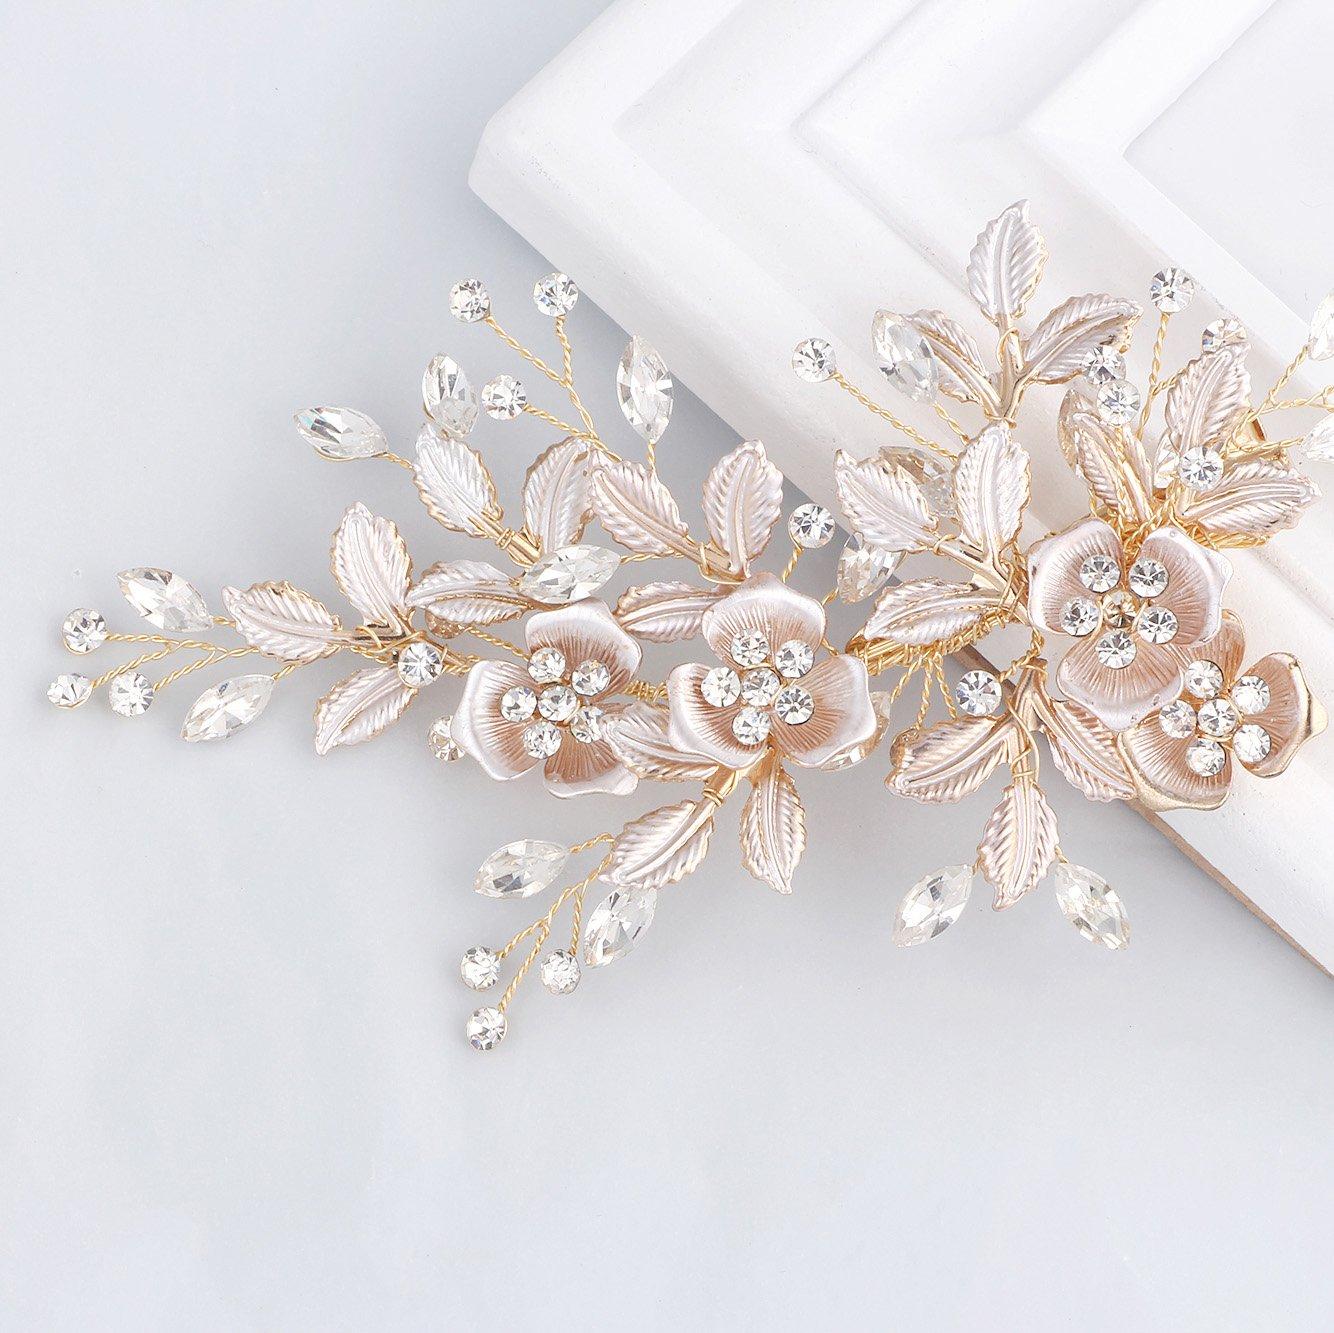 SWEETV Light Rose Gold Wedding Clip Rhinestone Bridal Comb Barrette - Handmade Flower Clip Head Pieces for Women by SWEETV